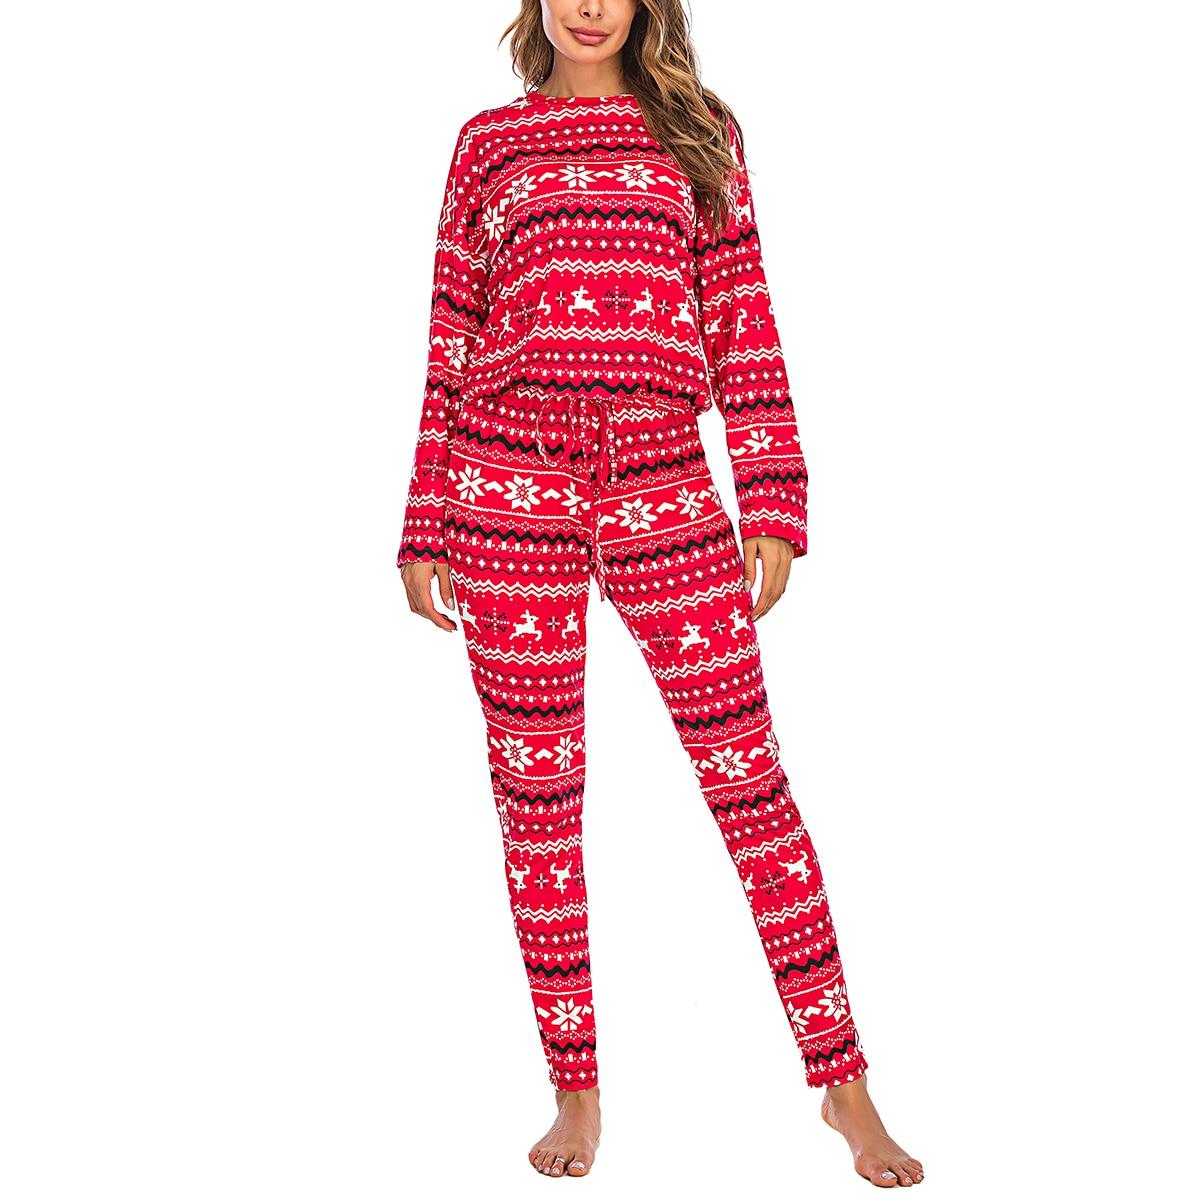 Women's Sleep Top, Christmas Shorts Suit, Round Collar Snowflake Elk Print Loose Elastic Home Clothes elk snowflake geometric print christmas hoodie